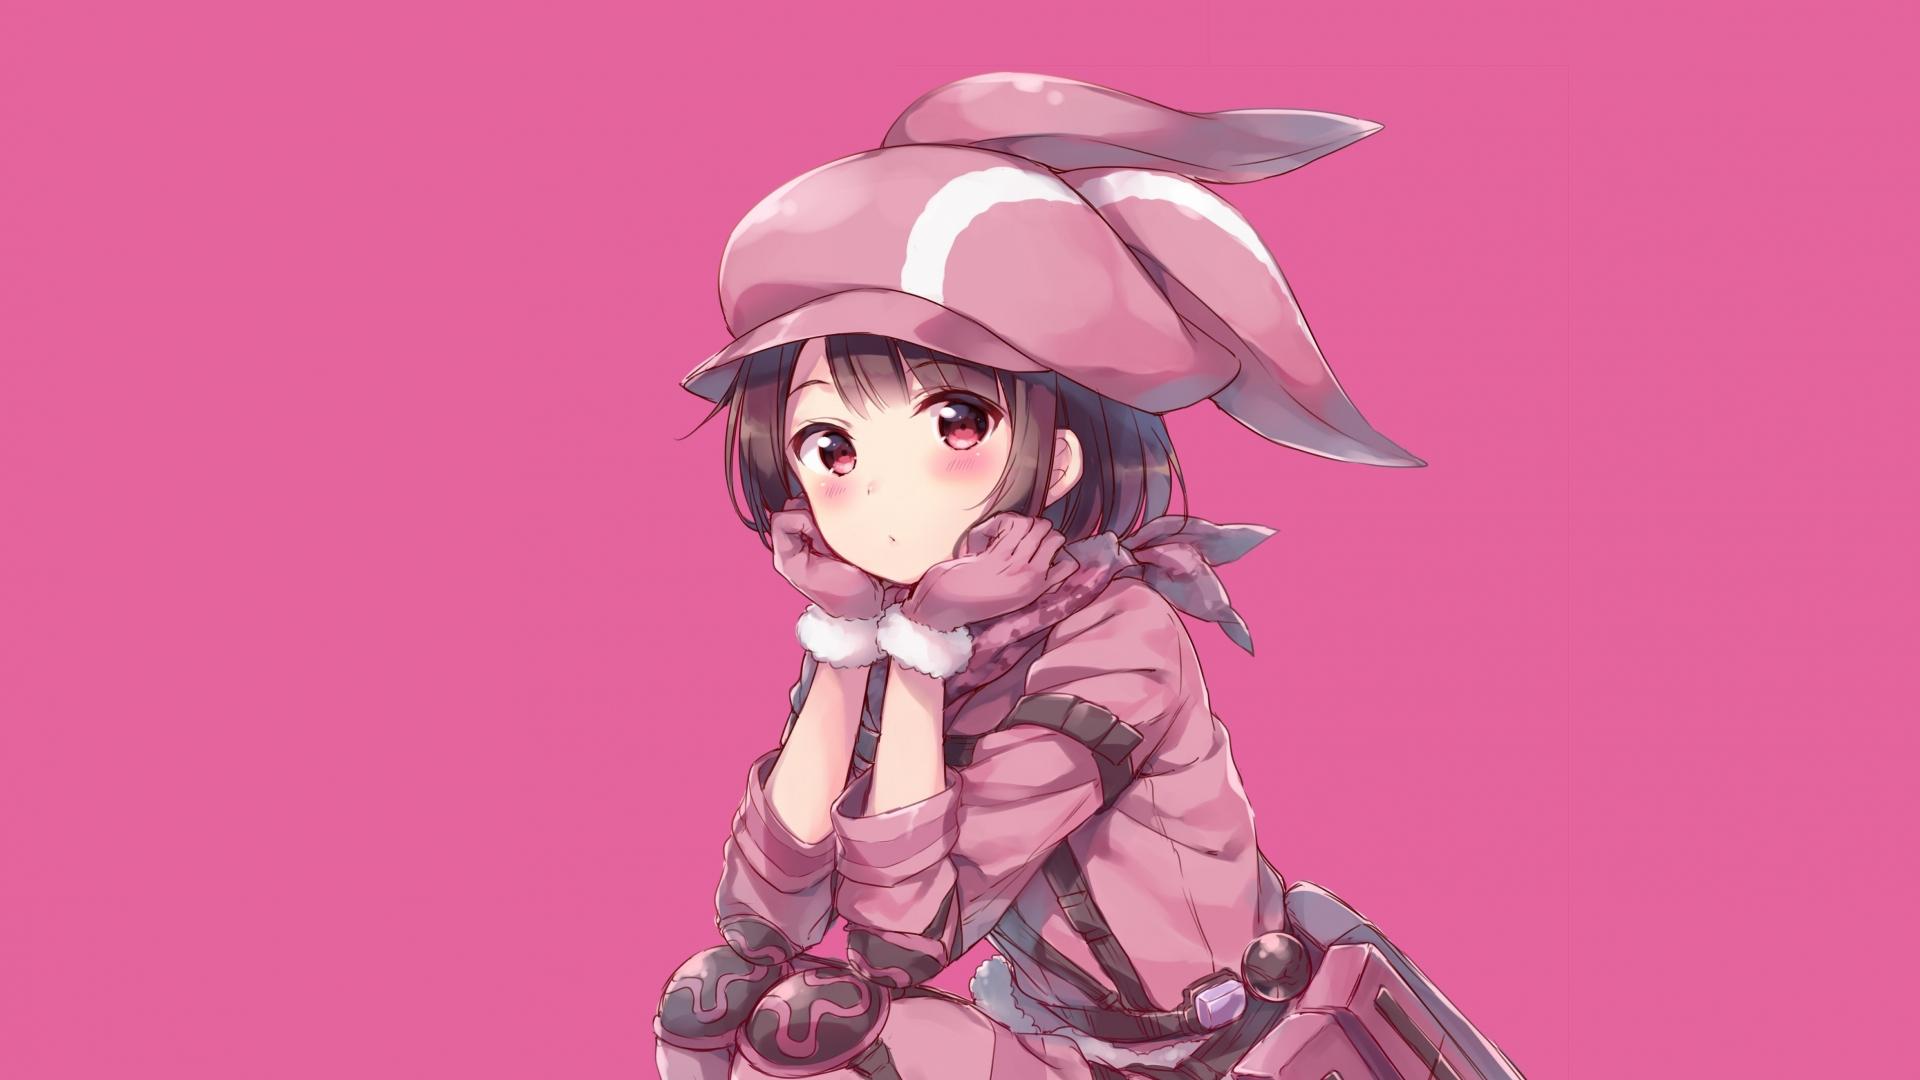 900 Wallpaper Anime Keren Full Hd HD Gratis